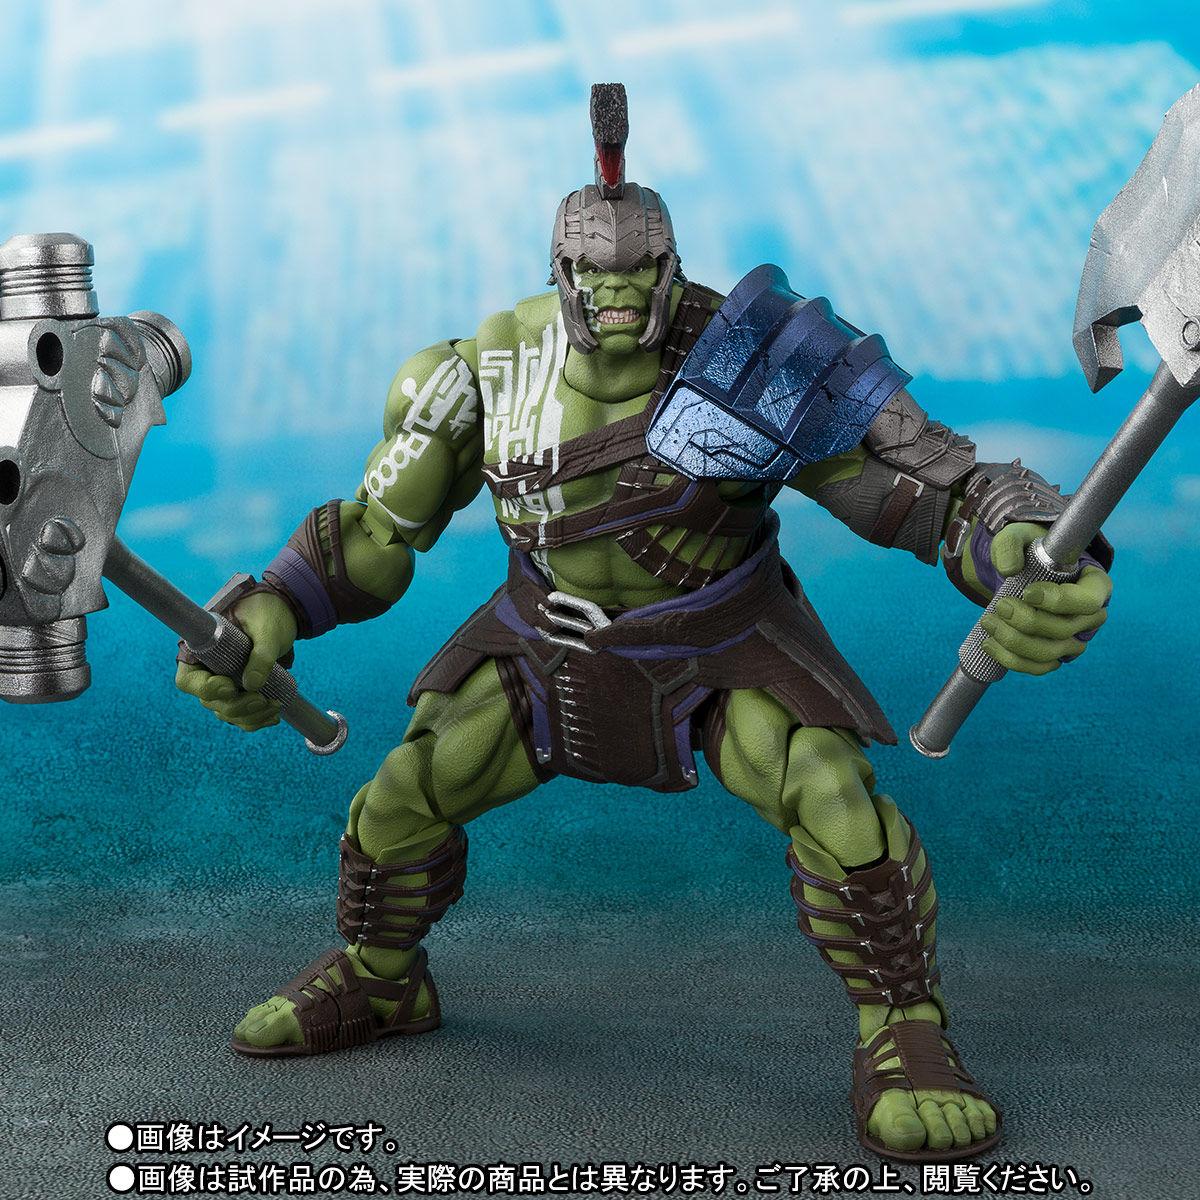 SH-Figuarts-Gladiator-Hulk-001